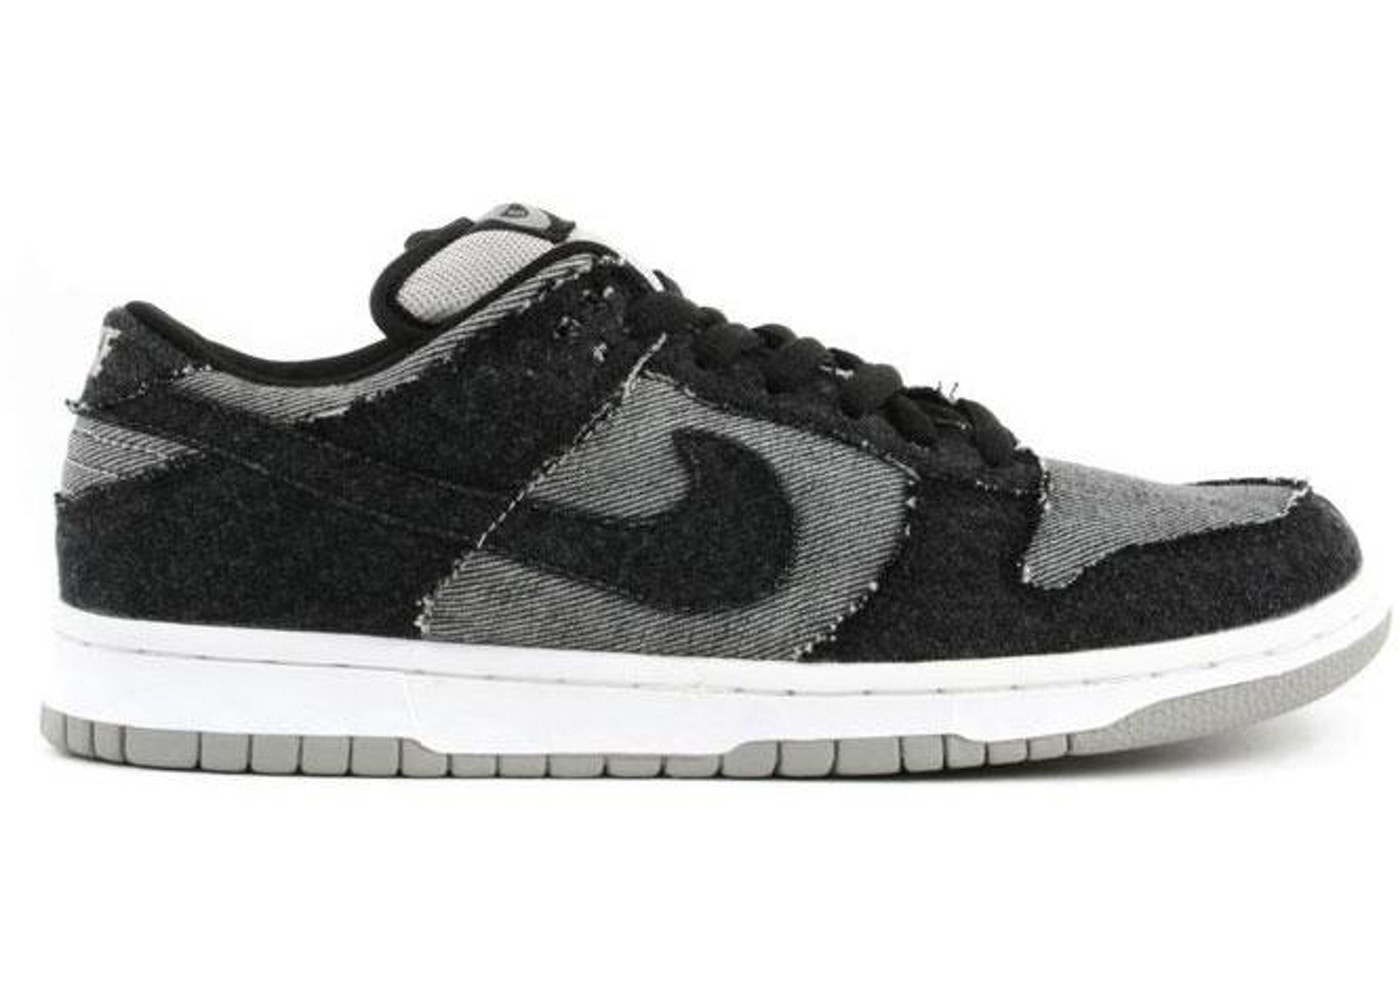 a0122064 Nike Dunk SB Low Medicom 2 - 304292-005